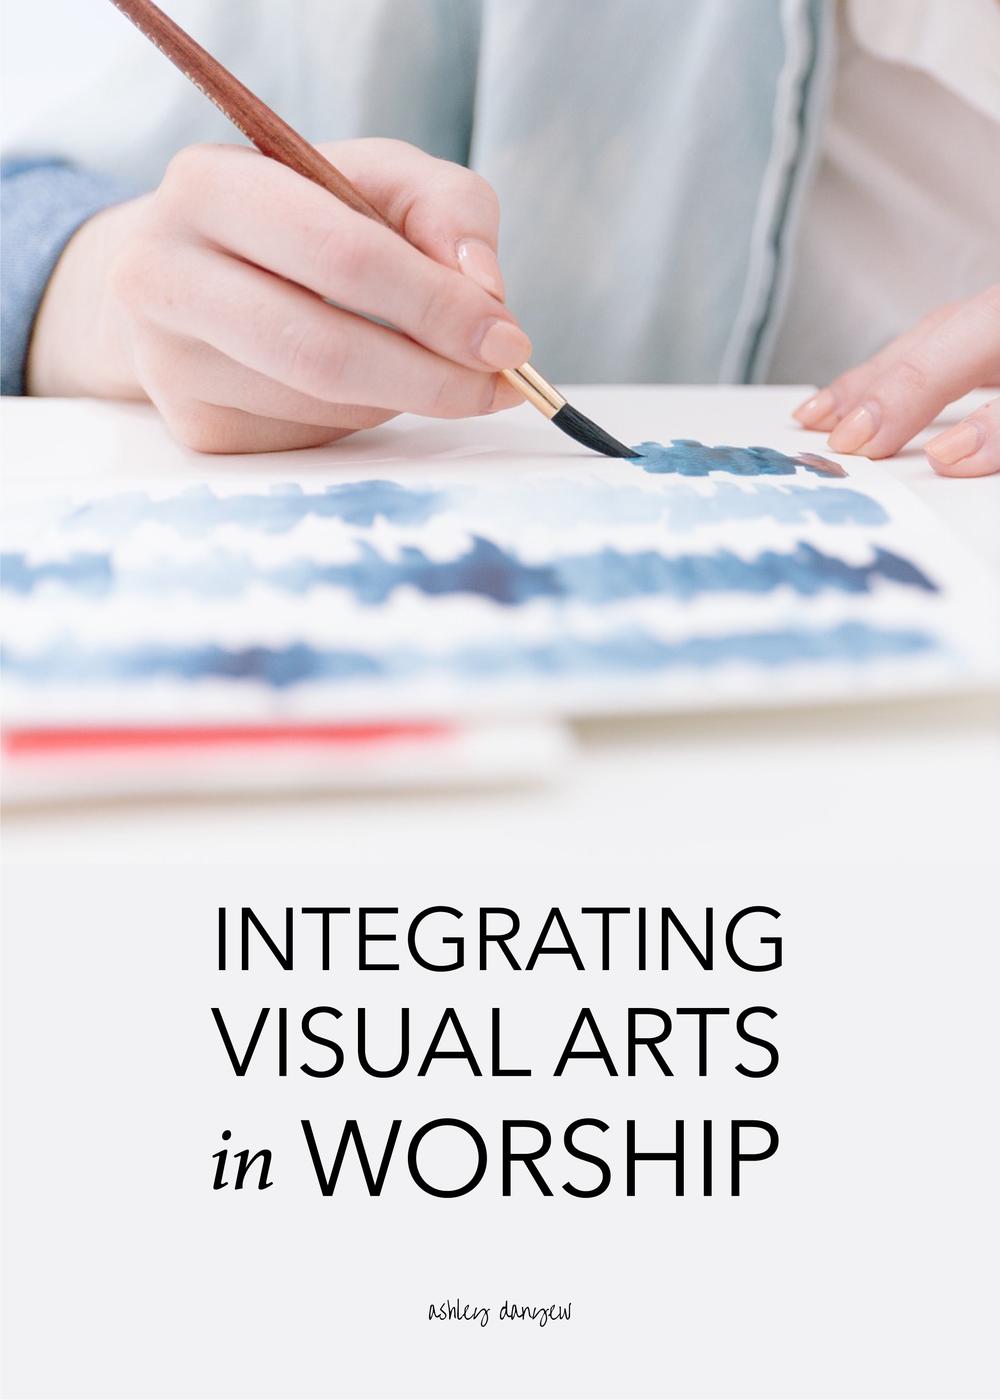 Copy of Integrating Visual Arts in Worship